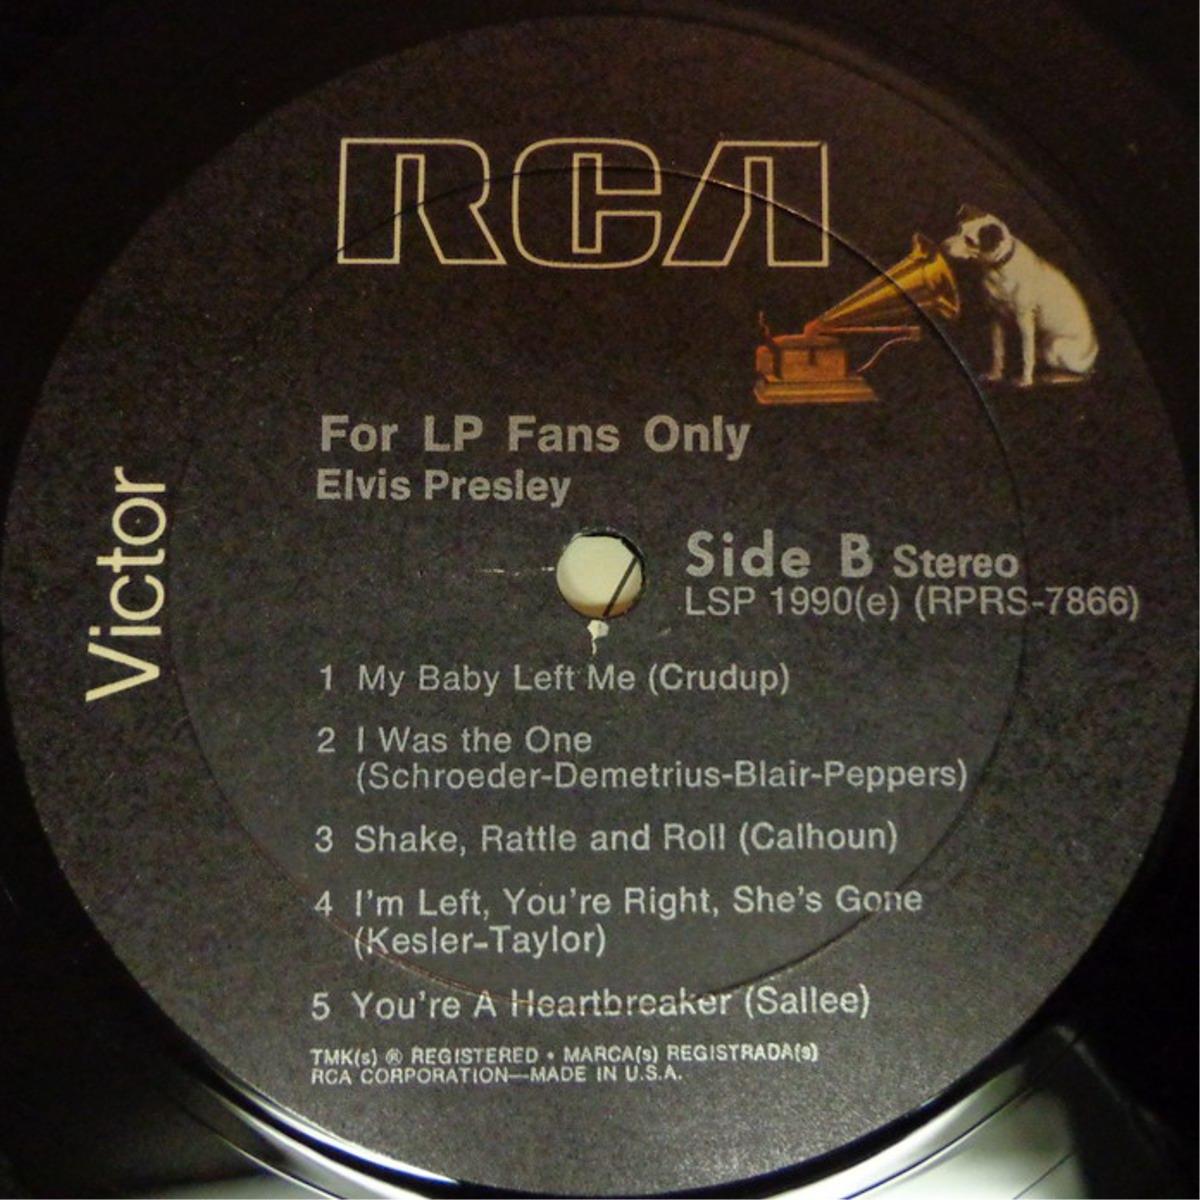 FOR LP FANS ONLY Lsp-1990d6gsga